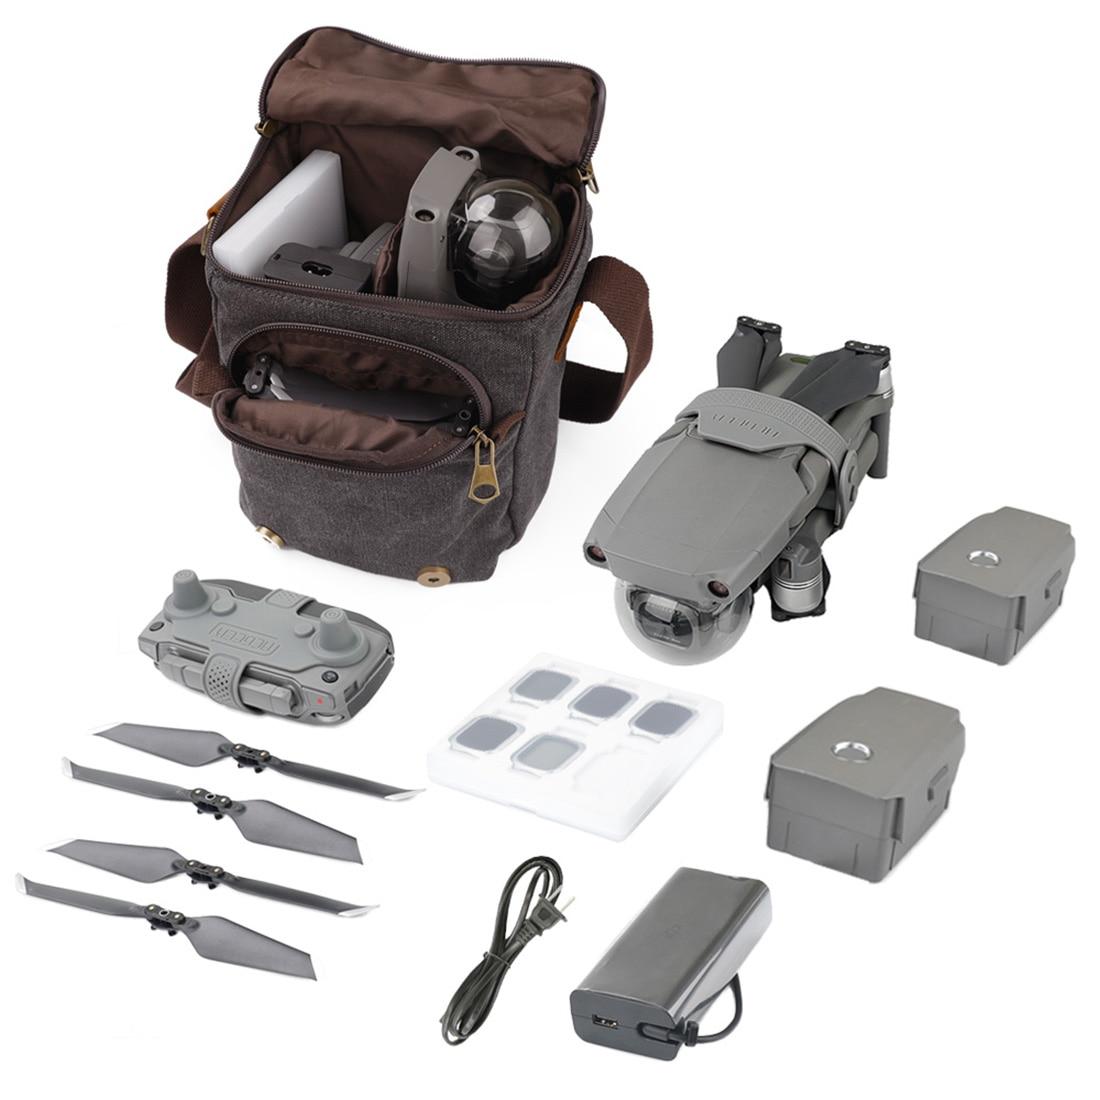 Sac à main étanche en toile de stockage sac à dos pour DJI Mavic 2/Mavic Pro/Mavic Air/Spark Drone caméra de voyage en plein Air sac à dos